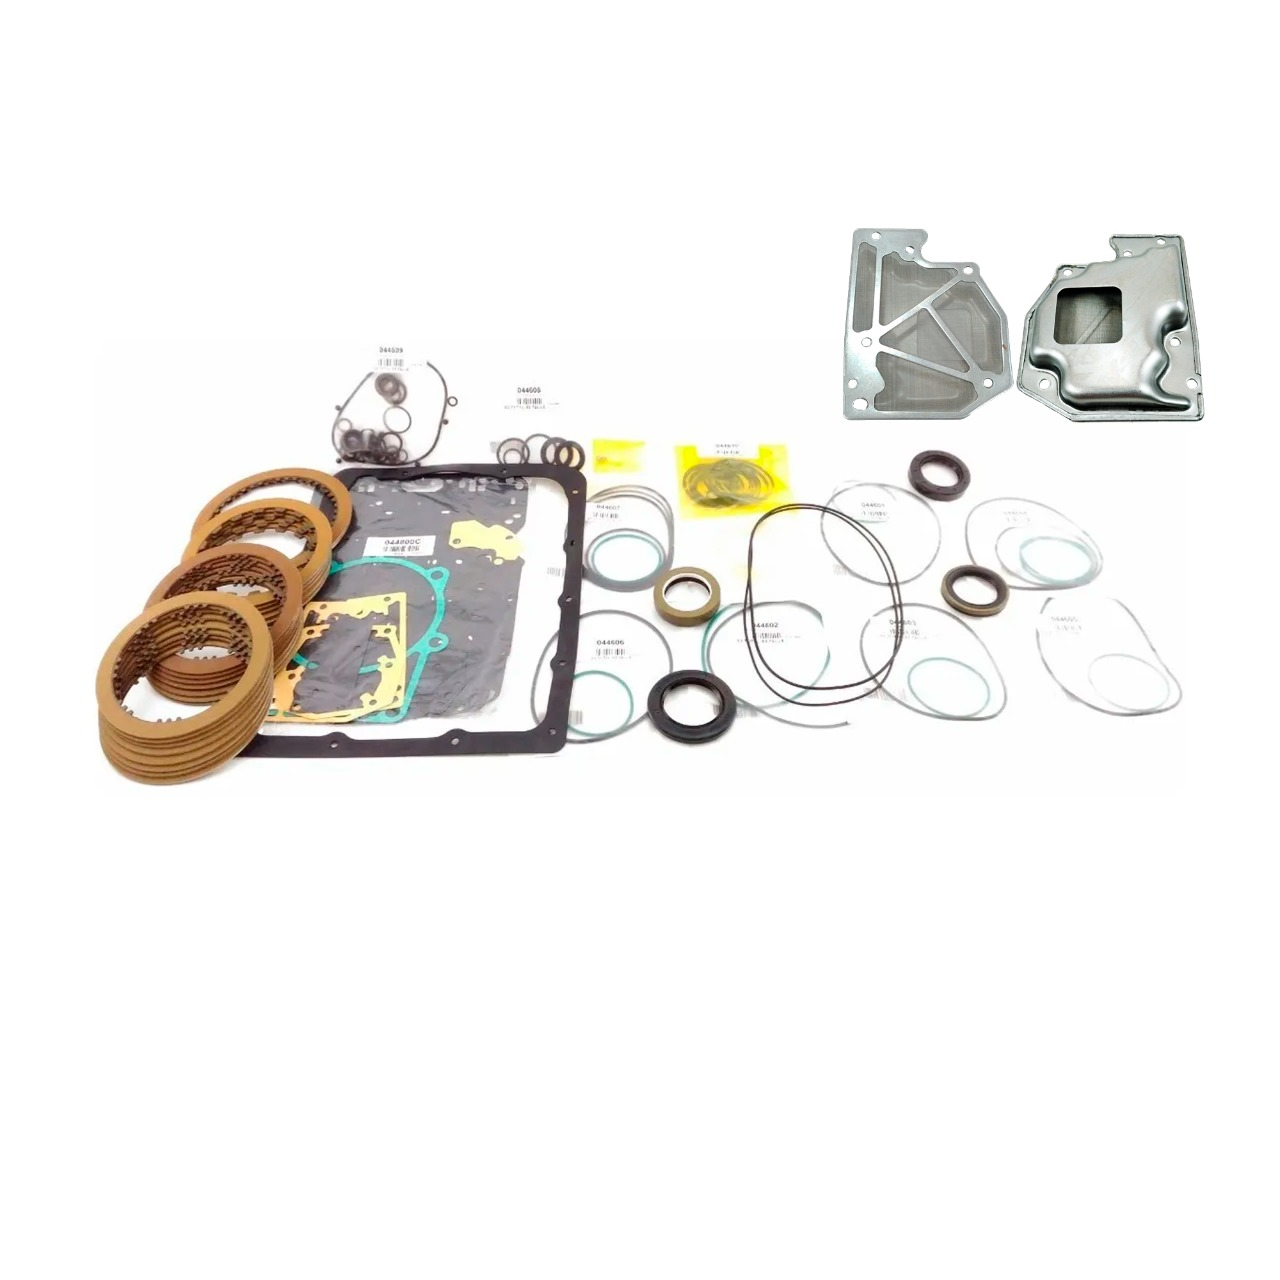 Banner Kit Filtro Do Câmbio Aut. 0372le Pajero L200 Tr4